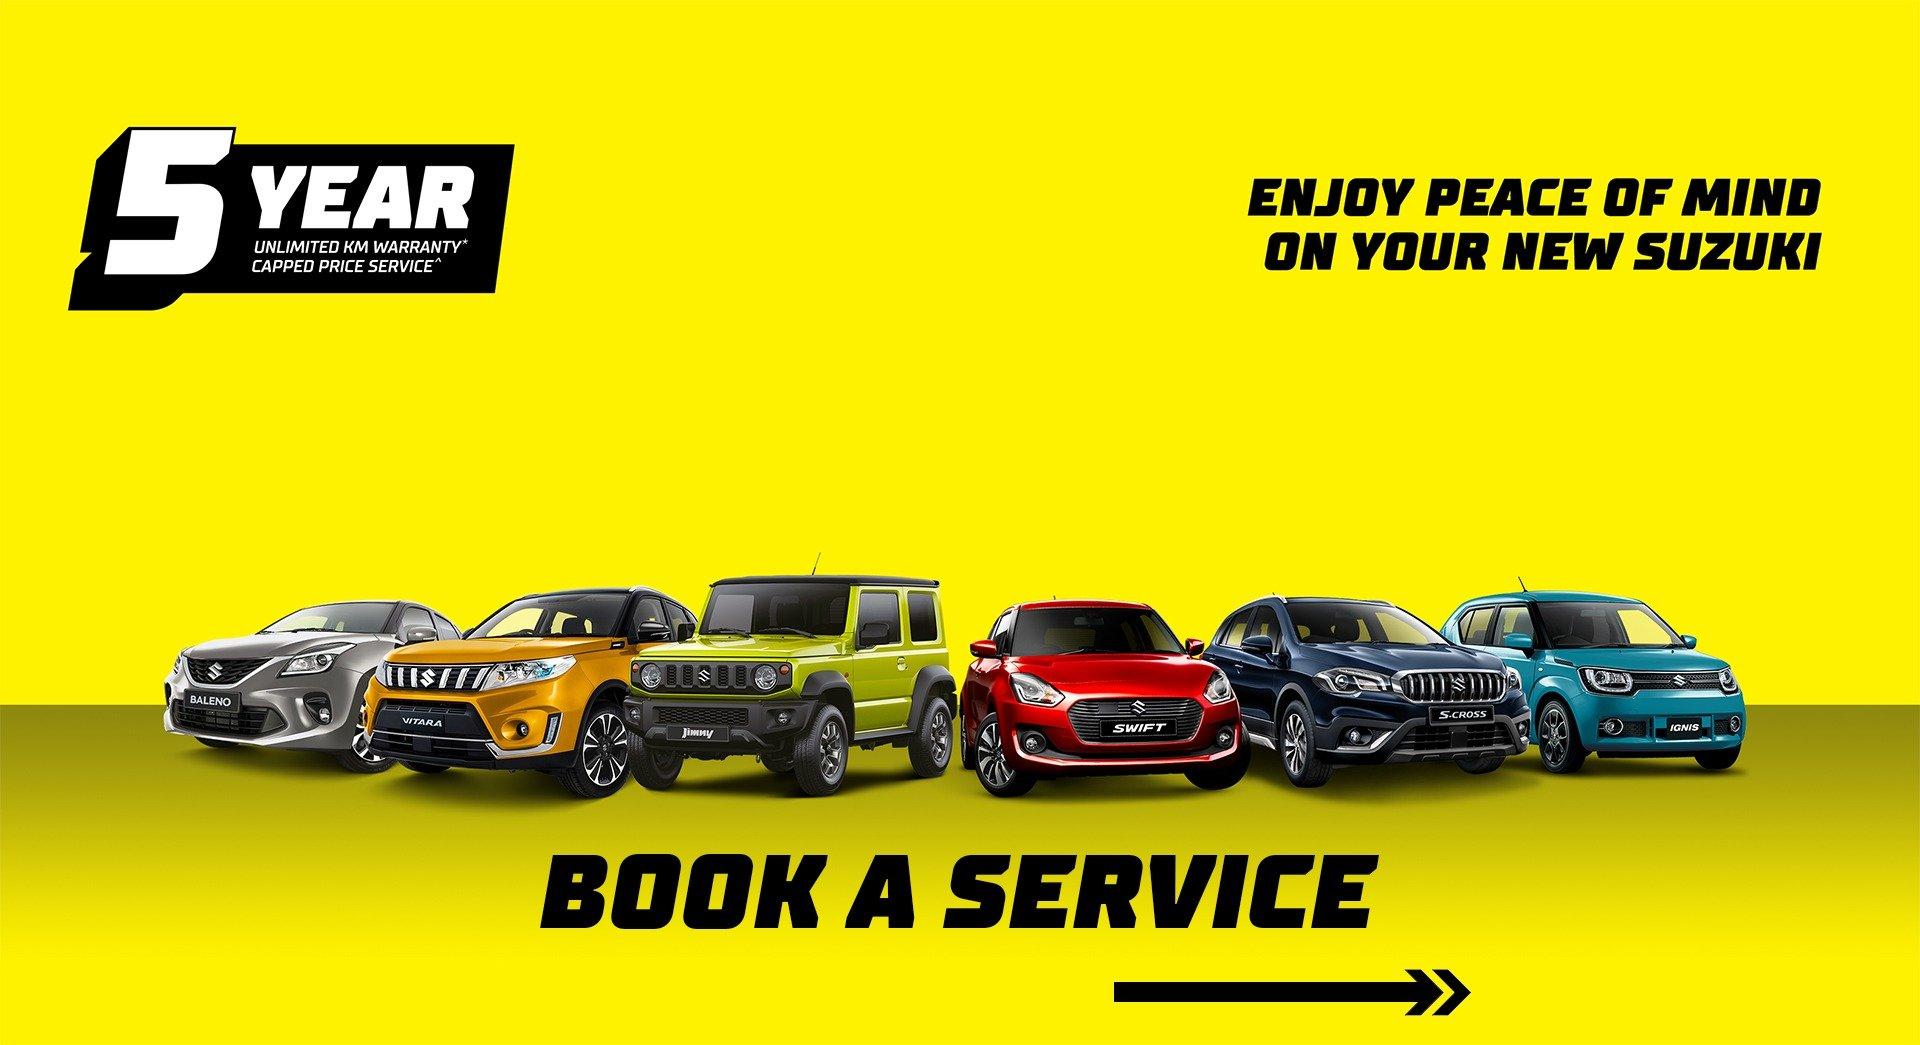 Suzuki-Book-A-Service-Mandurah-Suzuki